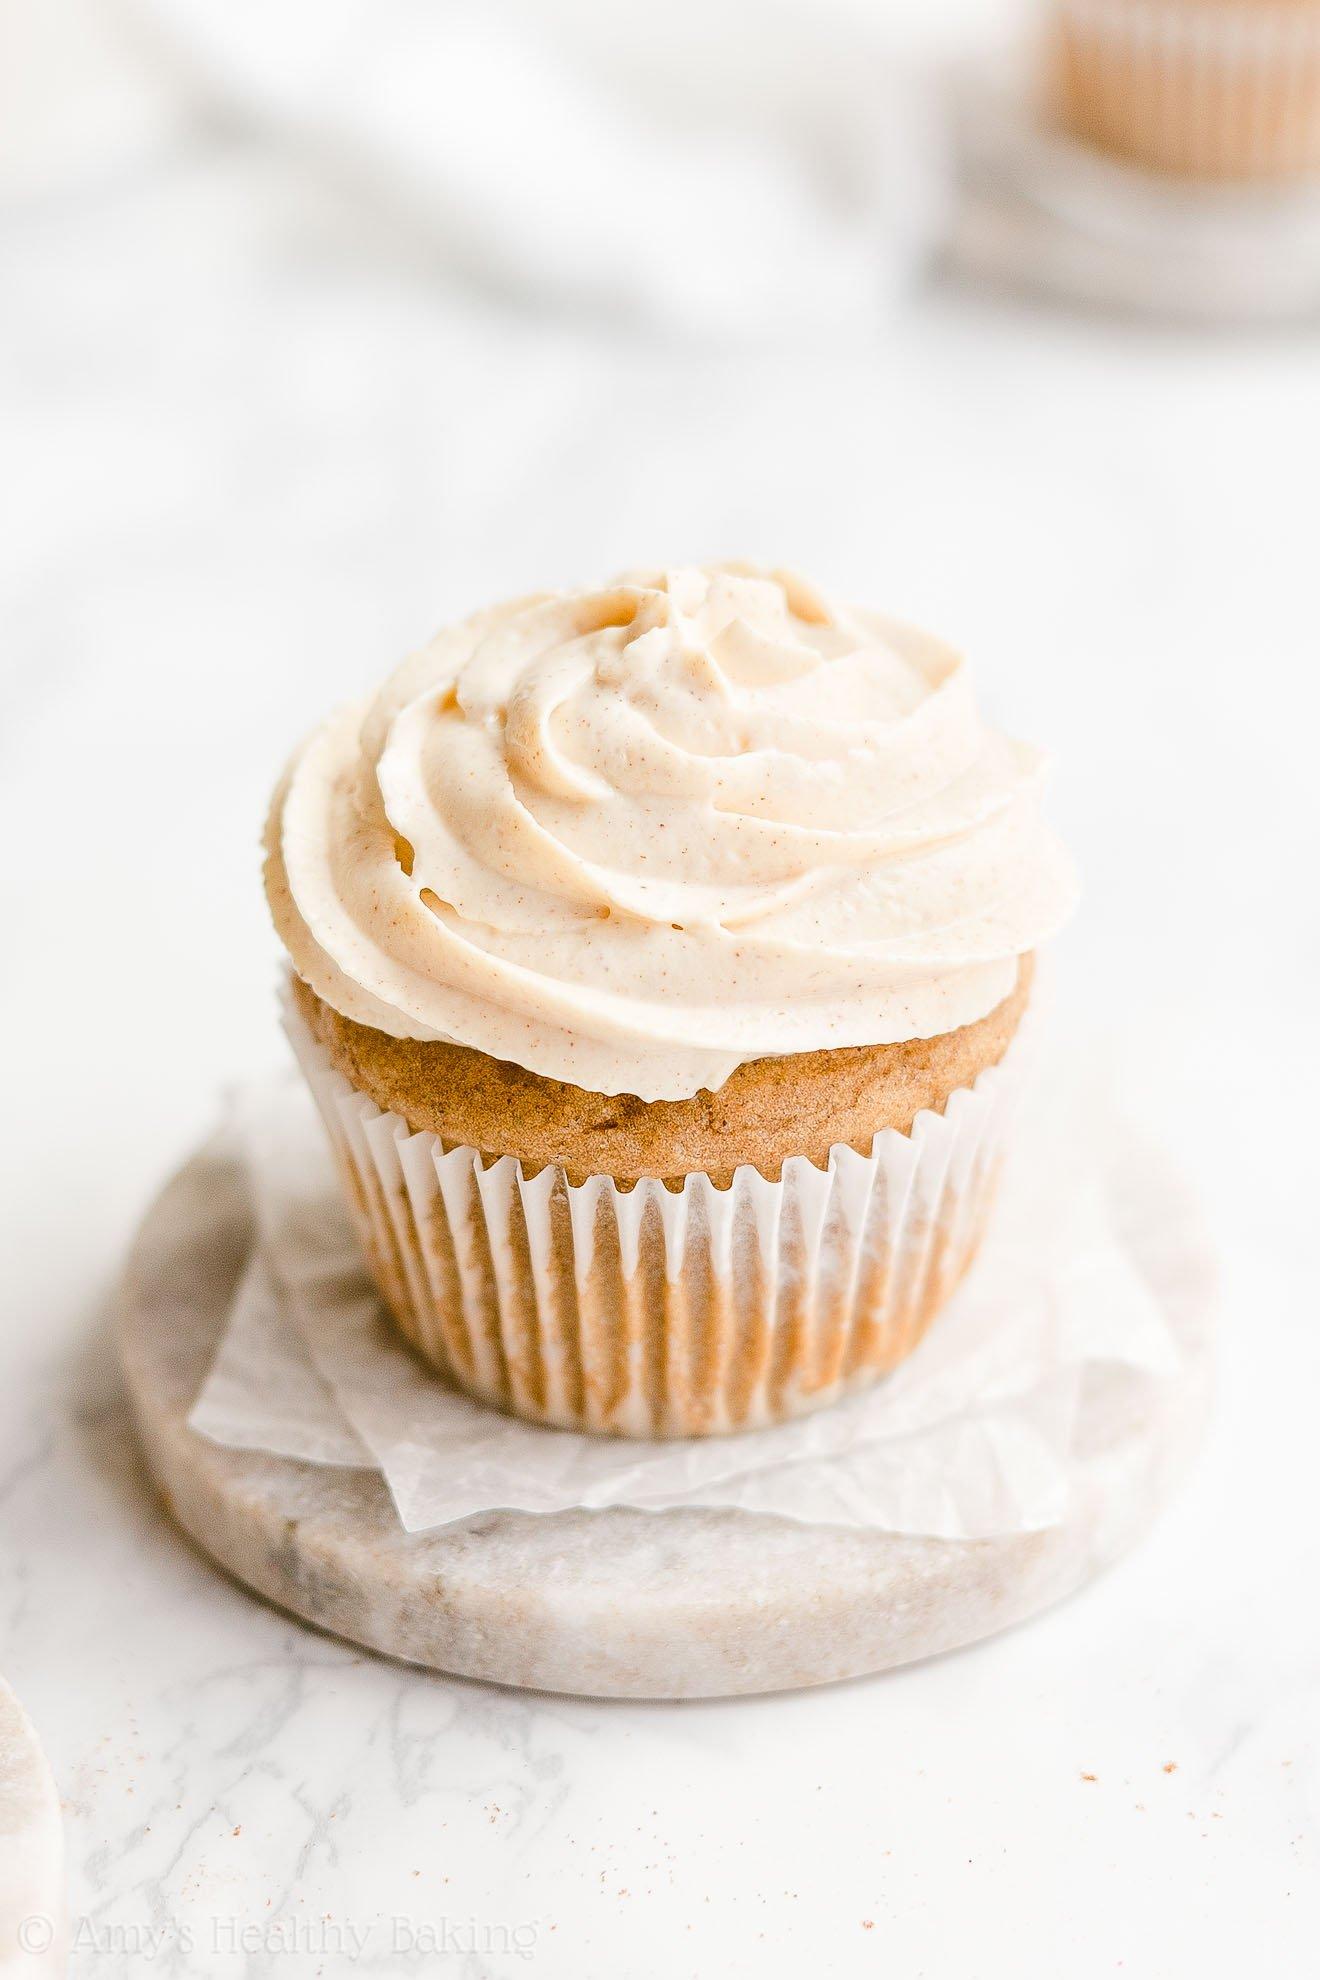 Healthy Gluten Free Eggnog Cupcakes with Greek Yogurt Frosting